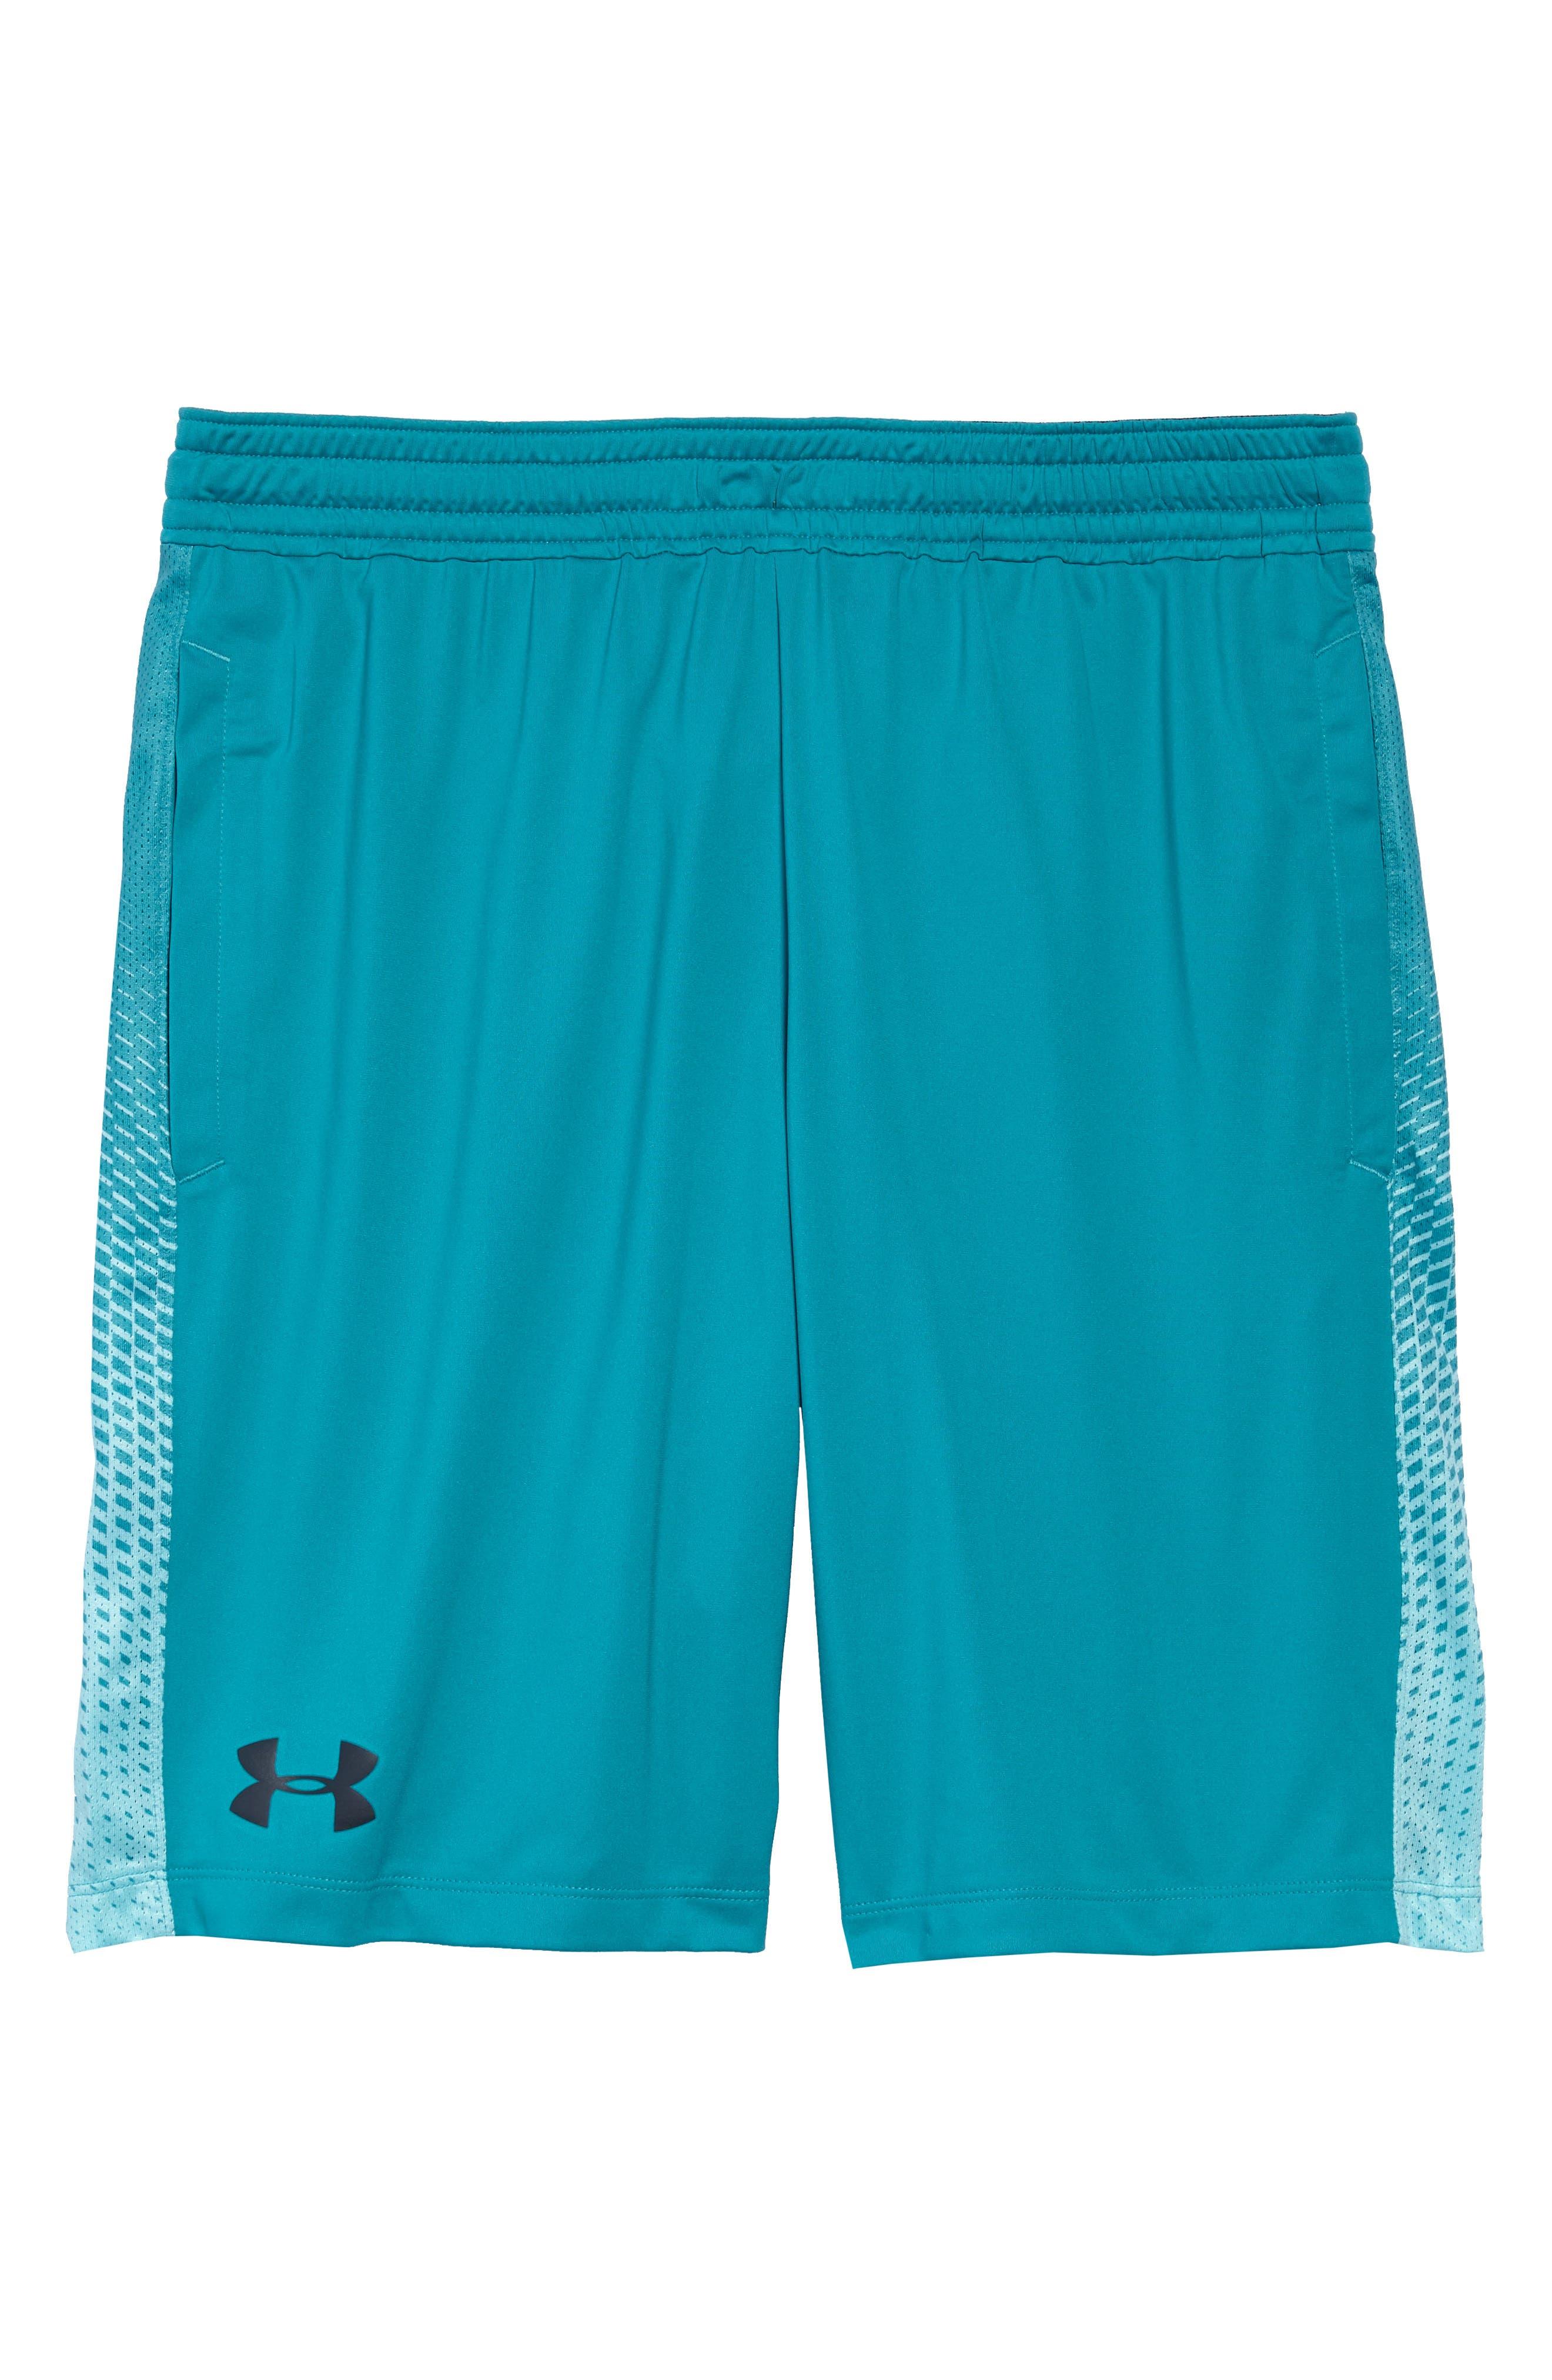 Mk1 Inset Fade Shorts,                             Alternate thumbnail 6, color,                             SWALLOWTAIL / TIDE / GREY